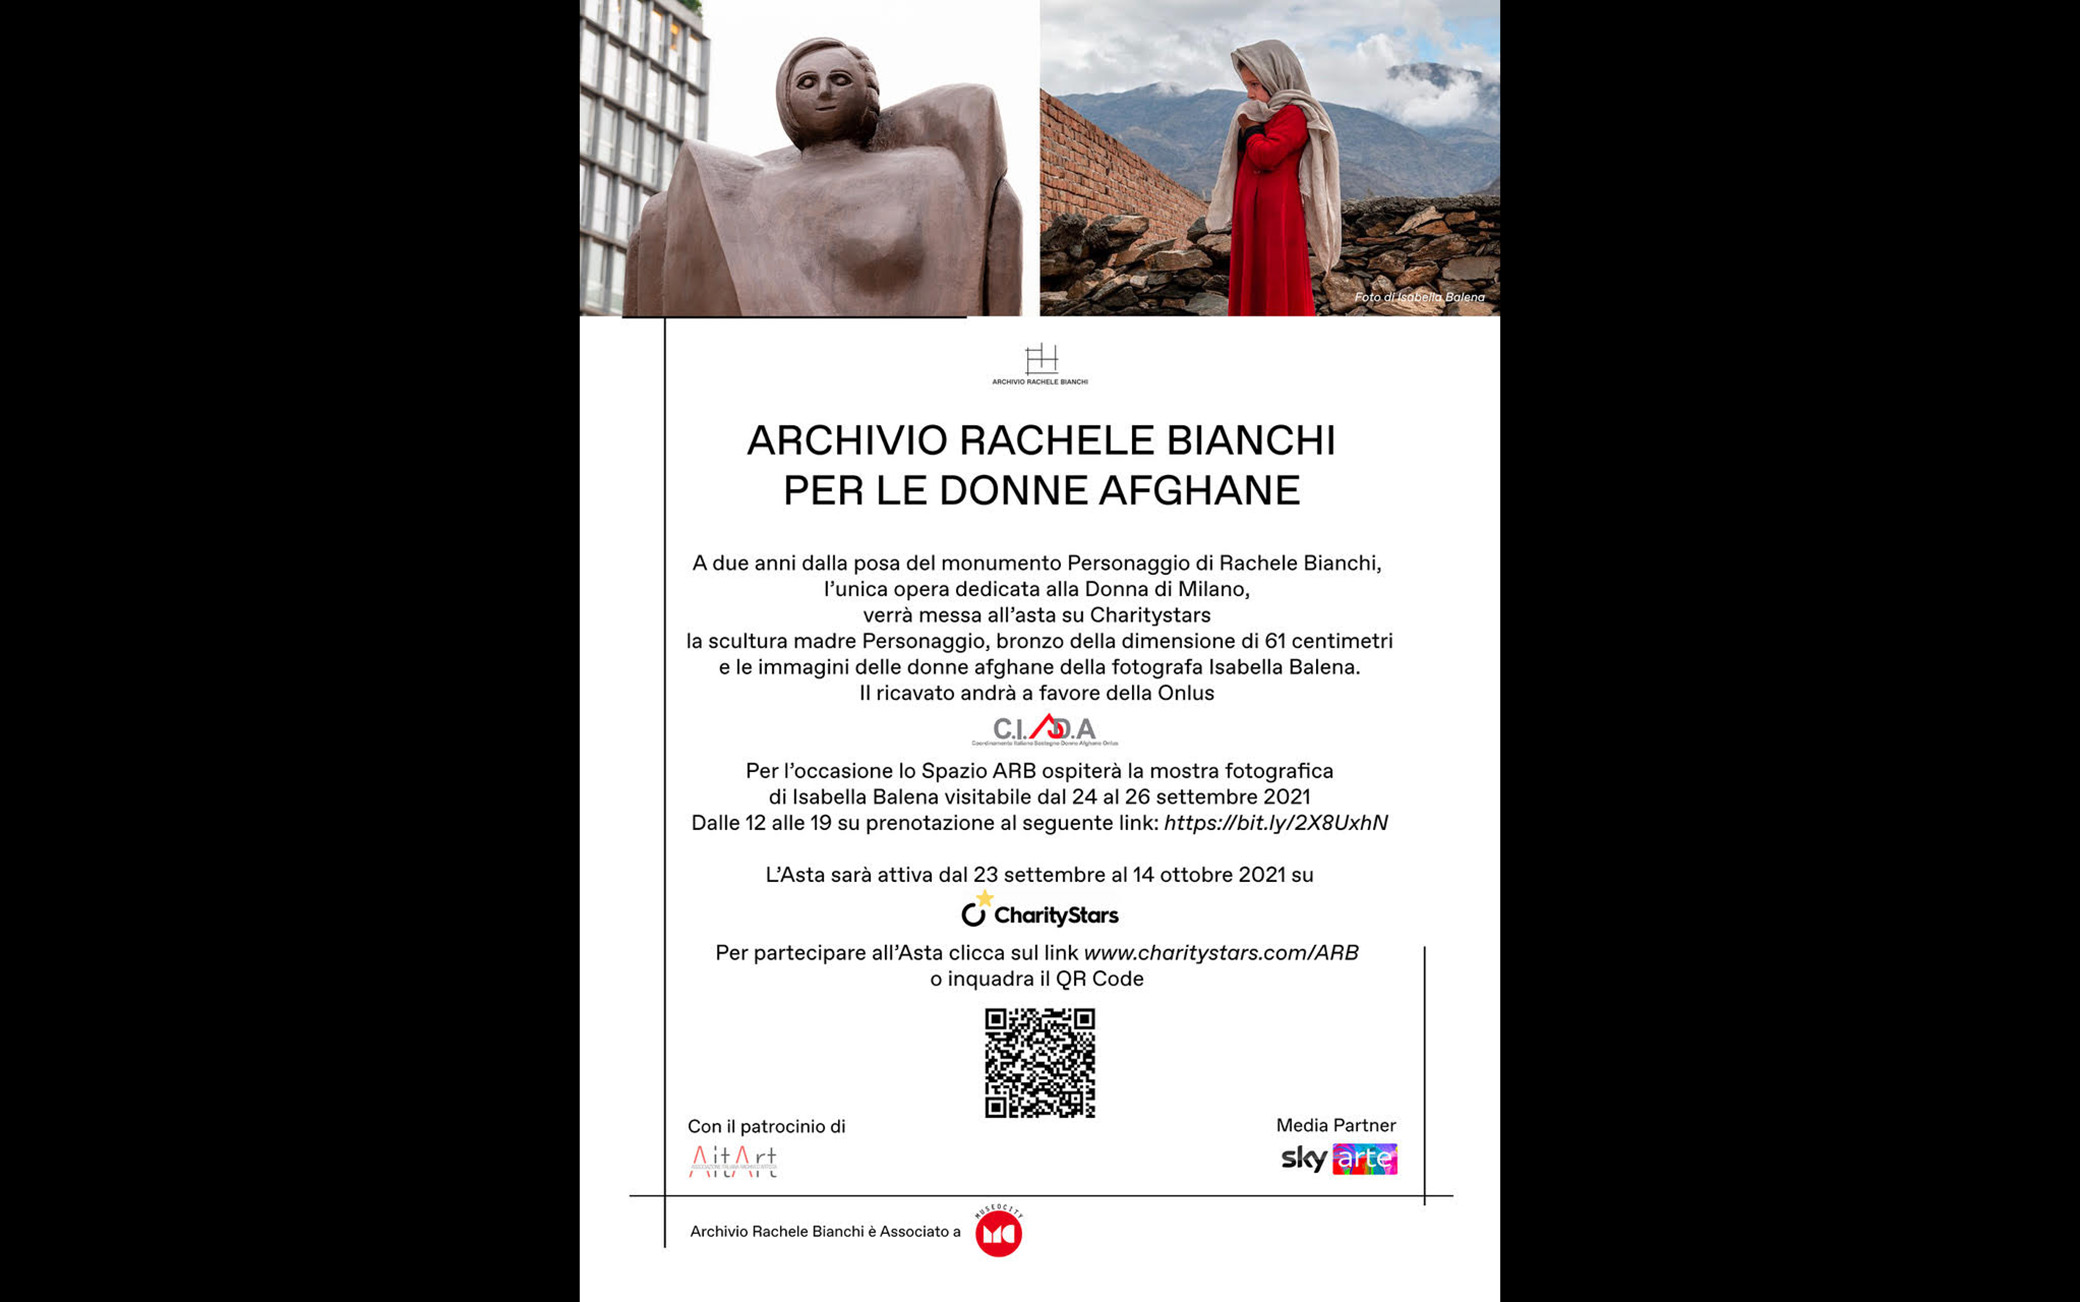 Archivio Rachele Bianchi